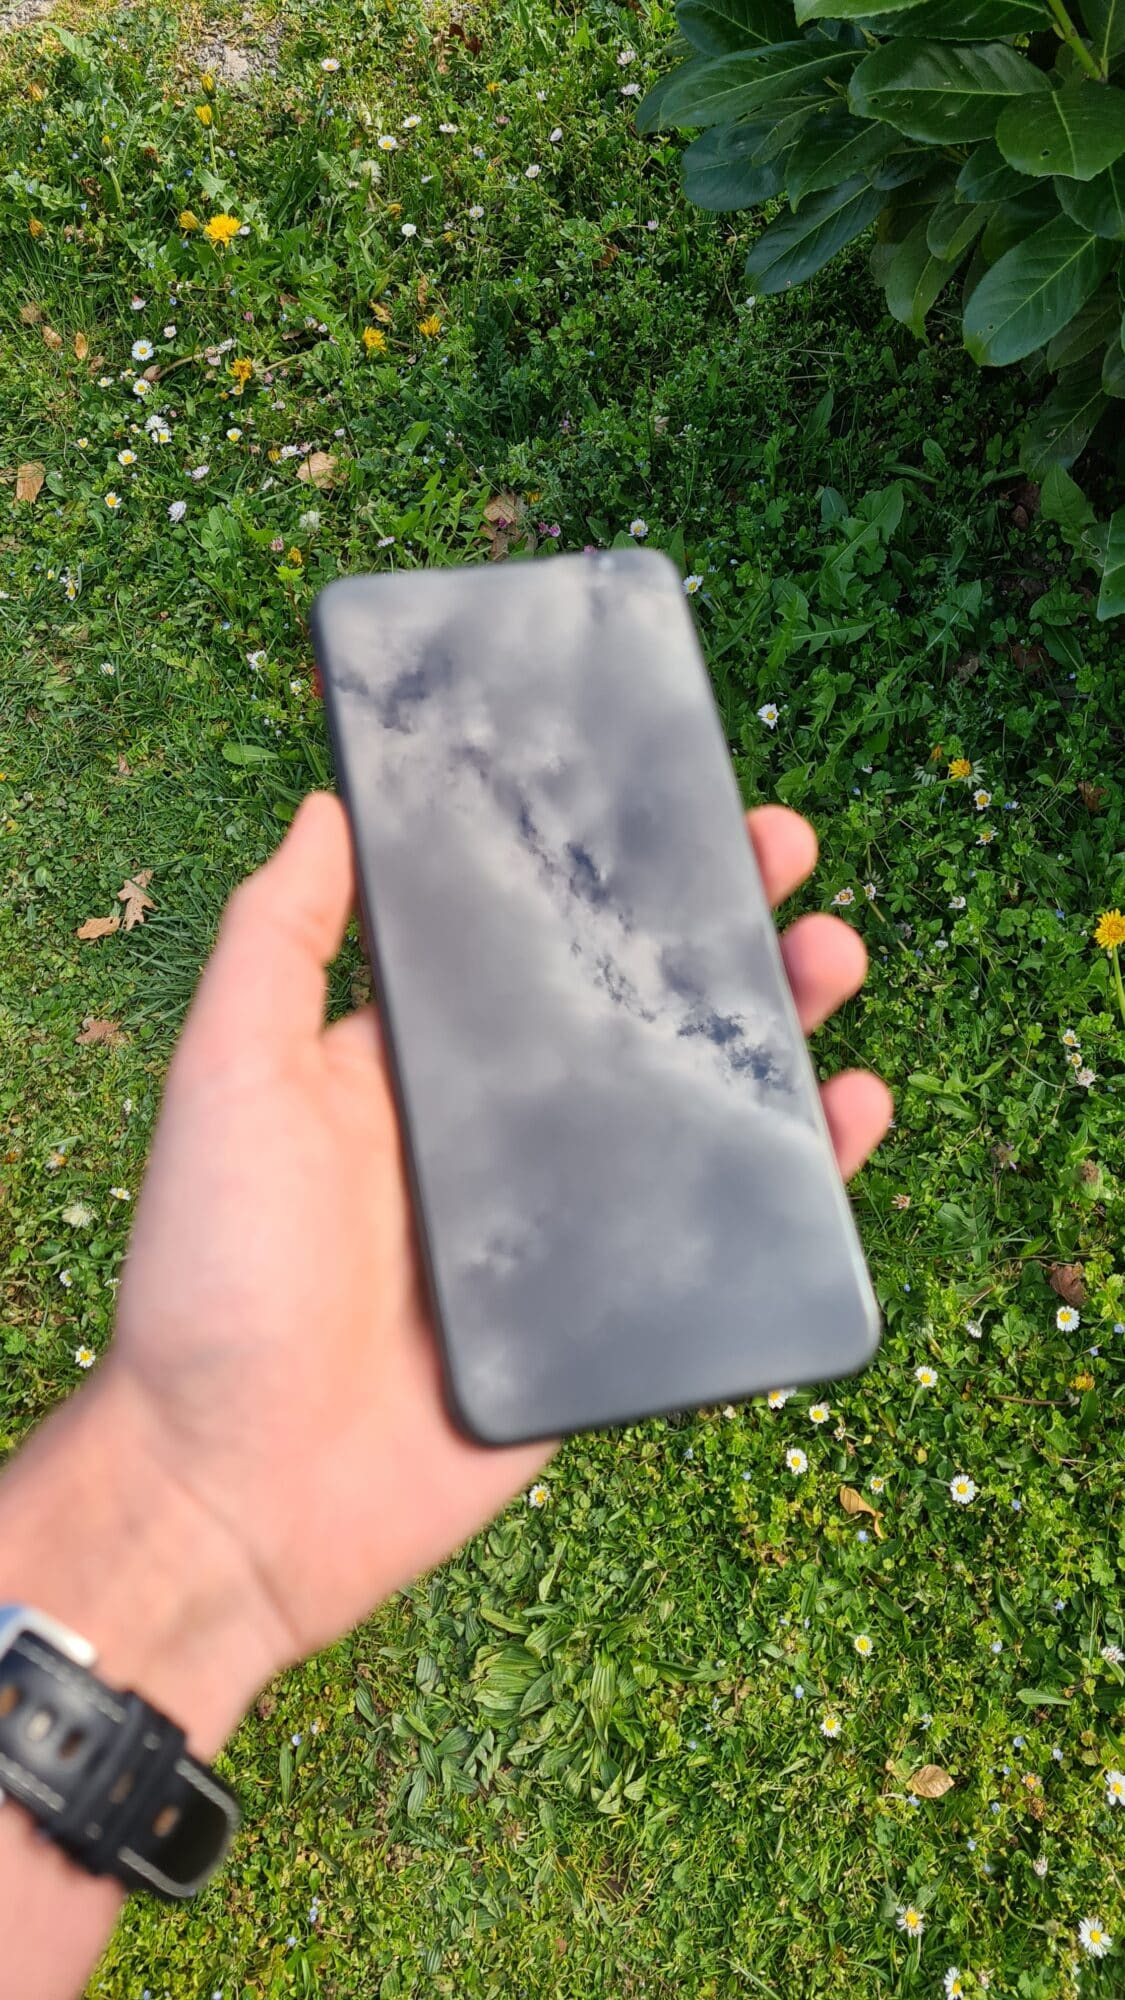 RedMagic 6, Test – RedMagic 6, le meilleur smartphone gamer en 2021 ?